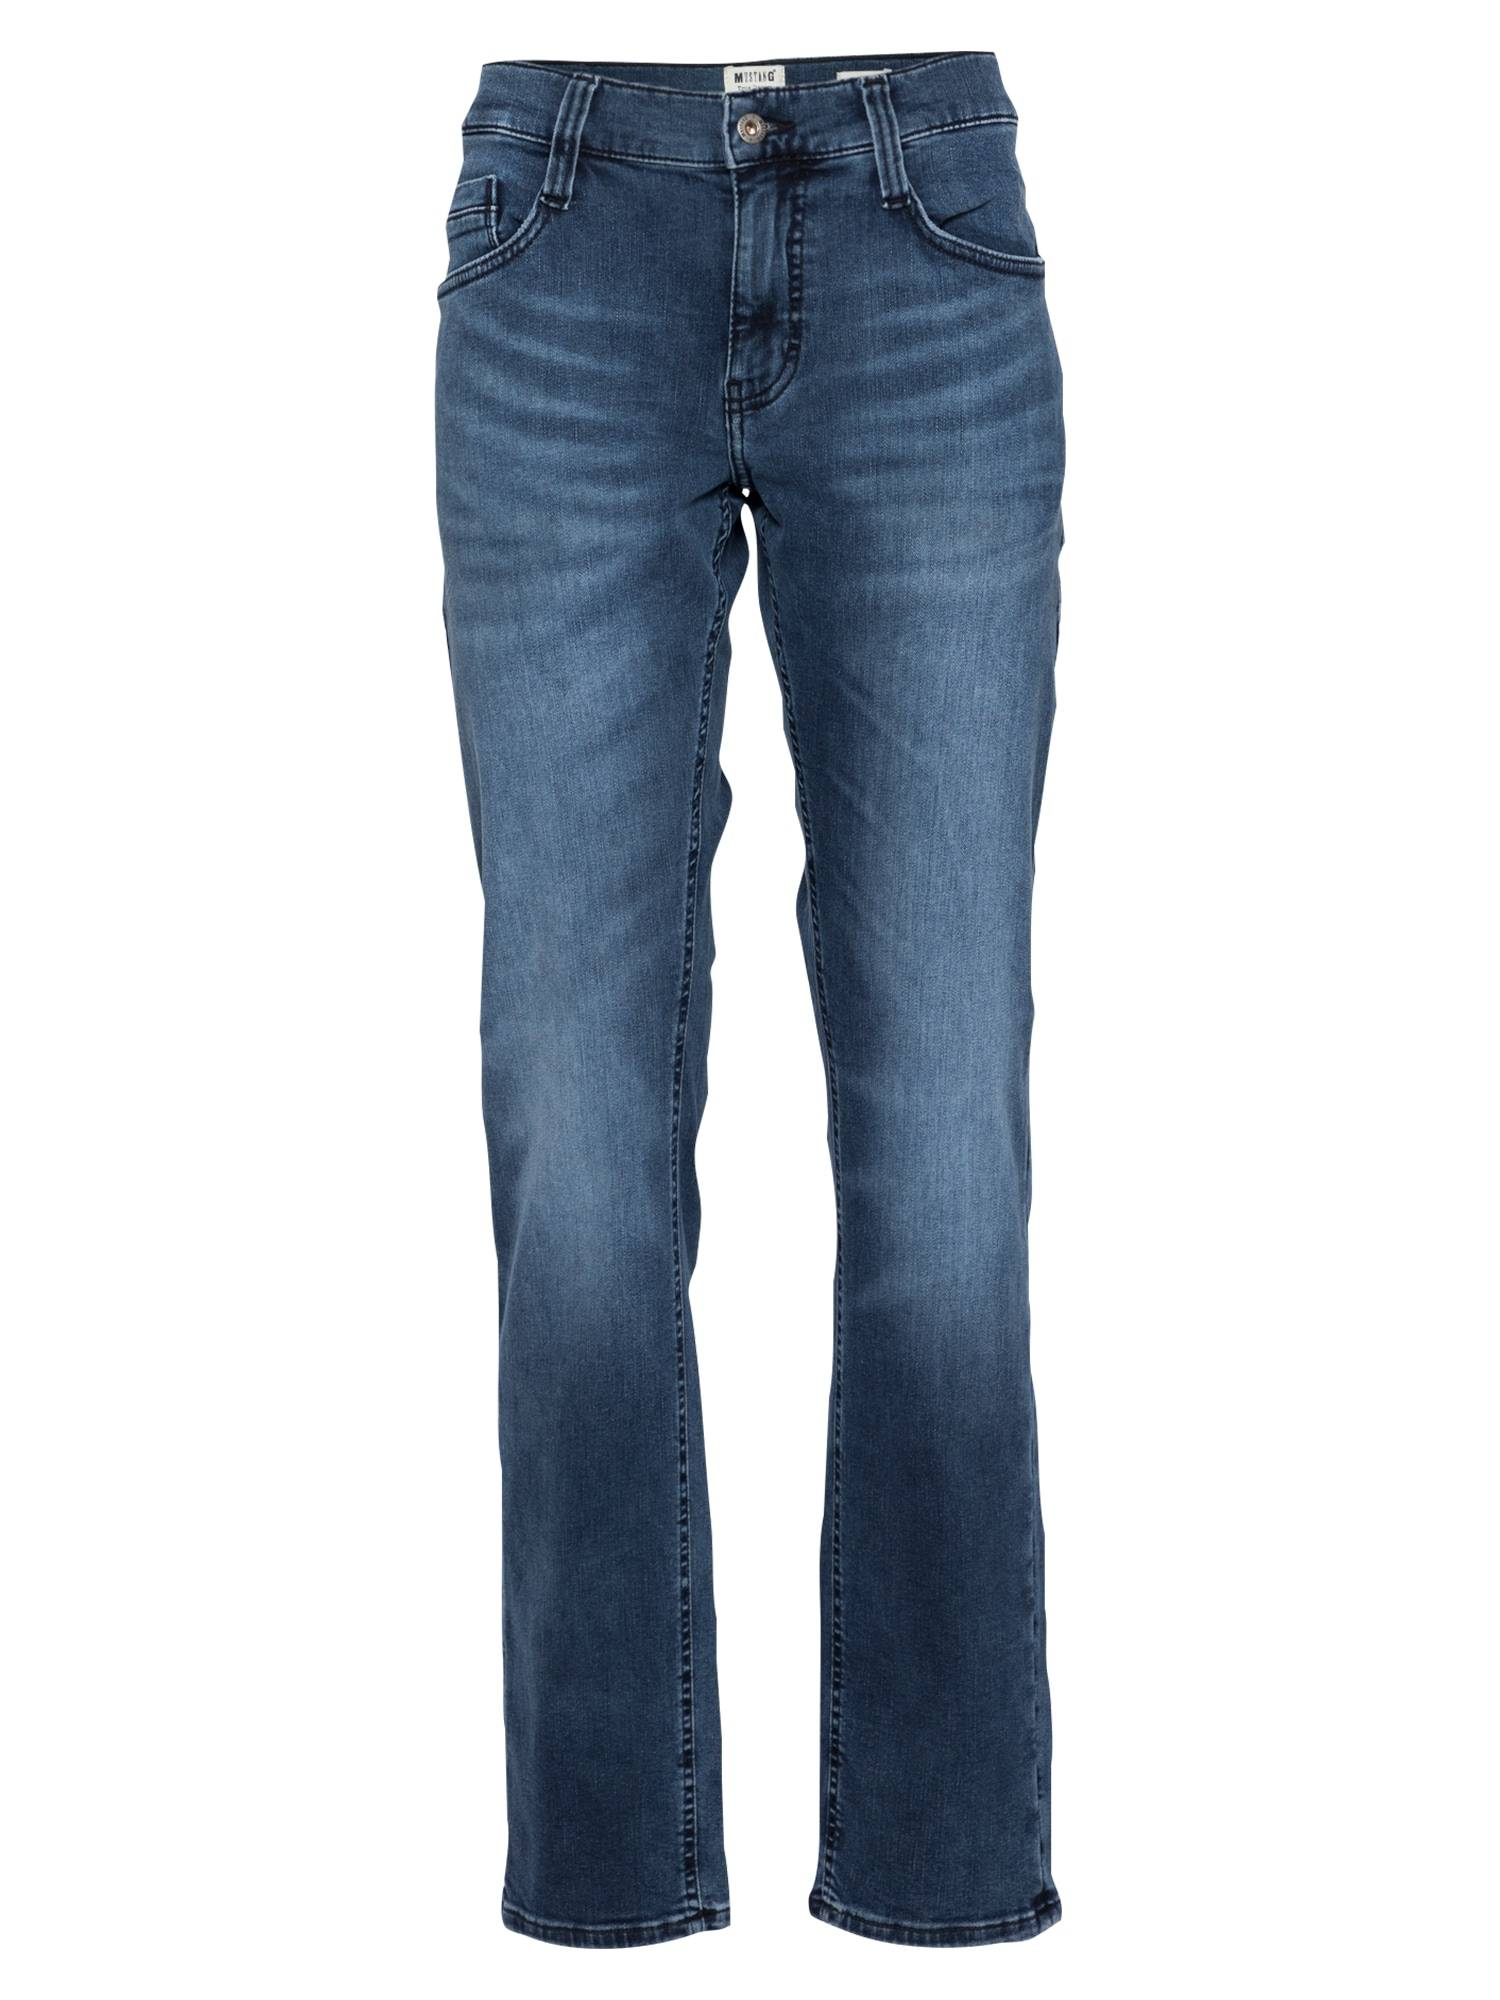 MUSTANG Jean 'Oregon'  - Bleu - Taille: 34/30 - male